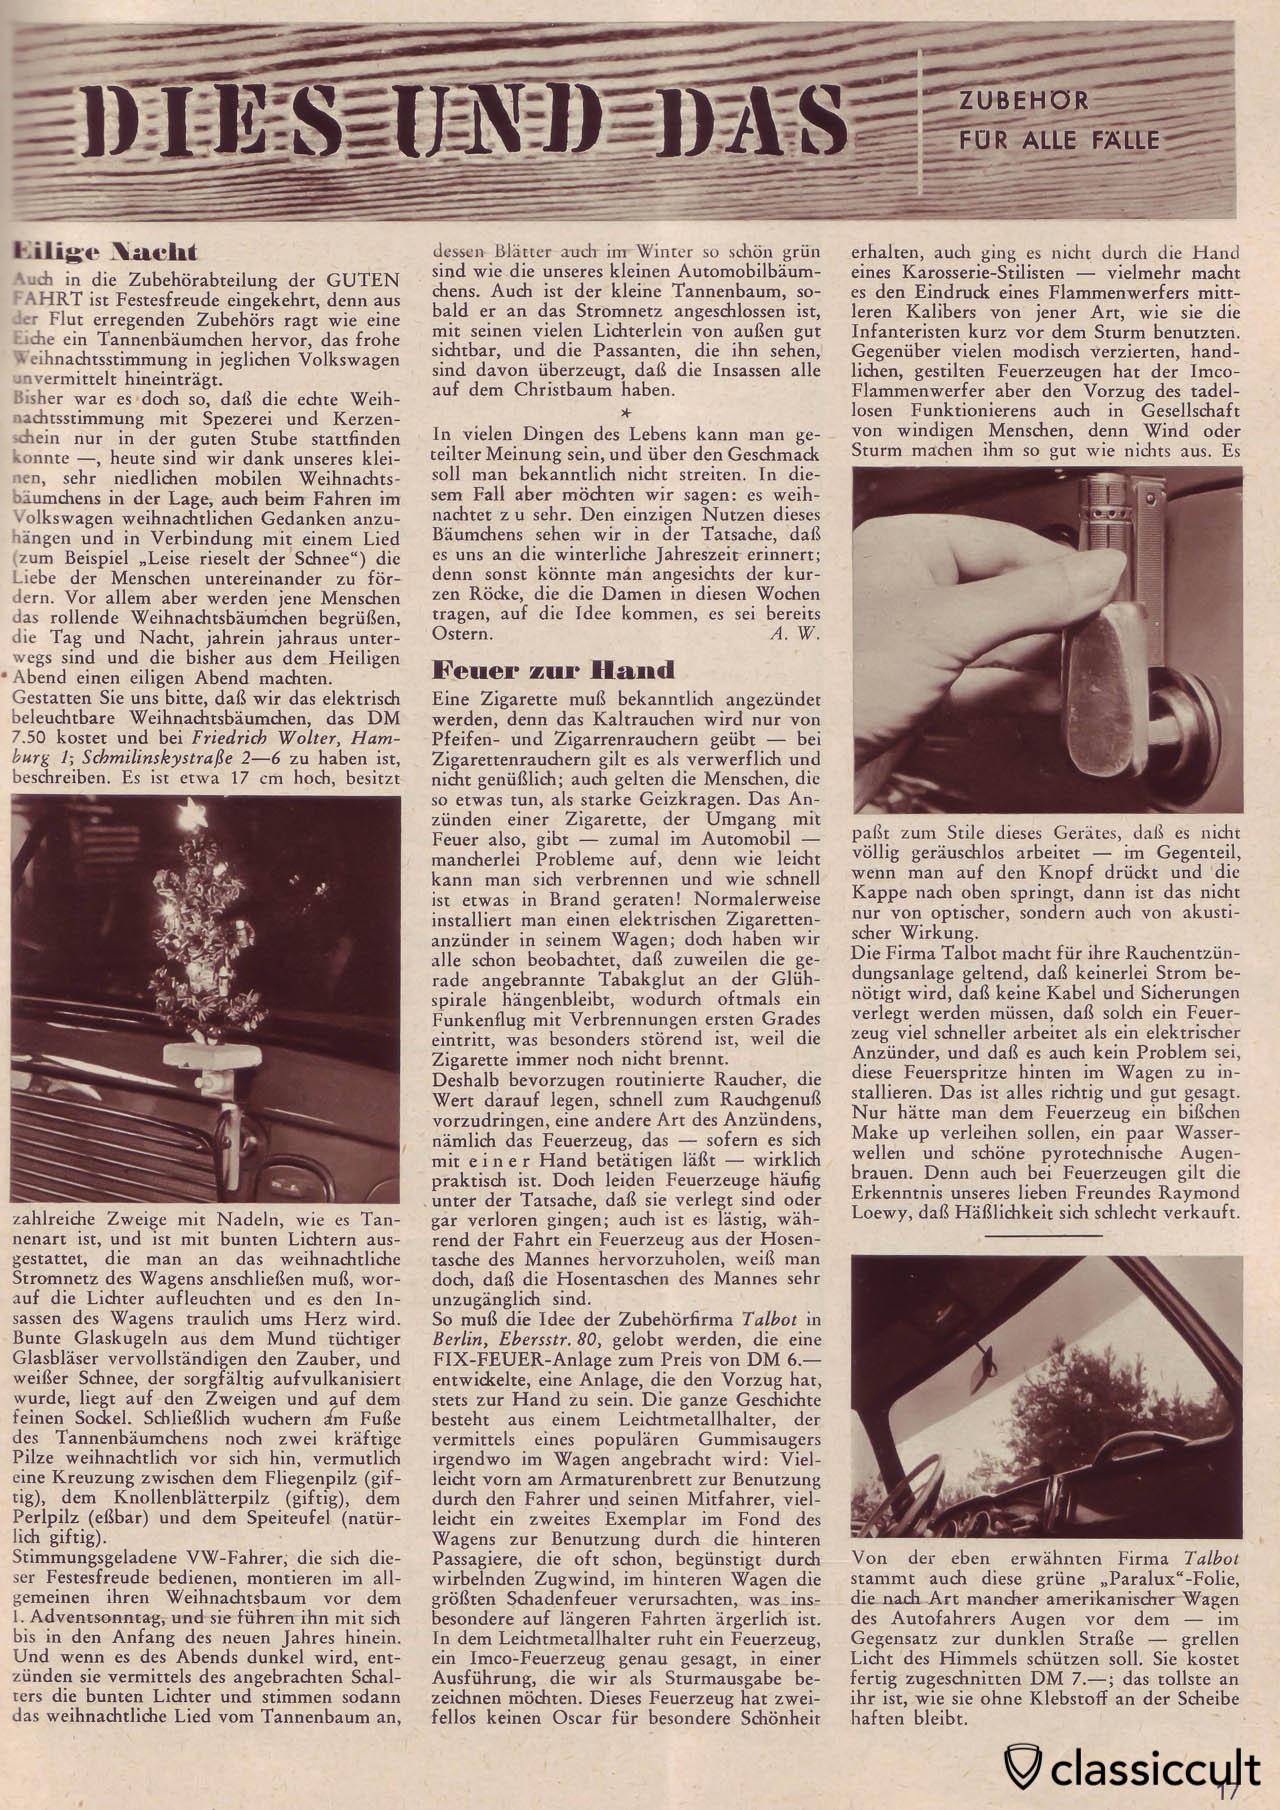 VW oval bug christmas tree, Gute Fahrt Magazine 12/1958